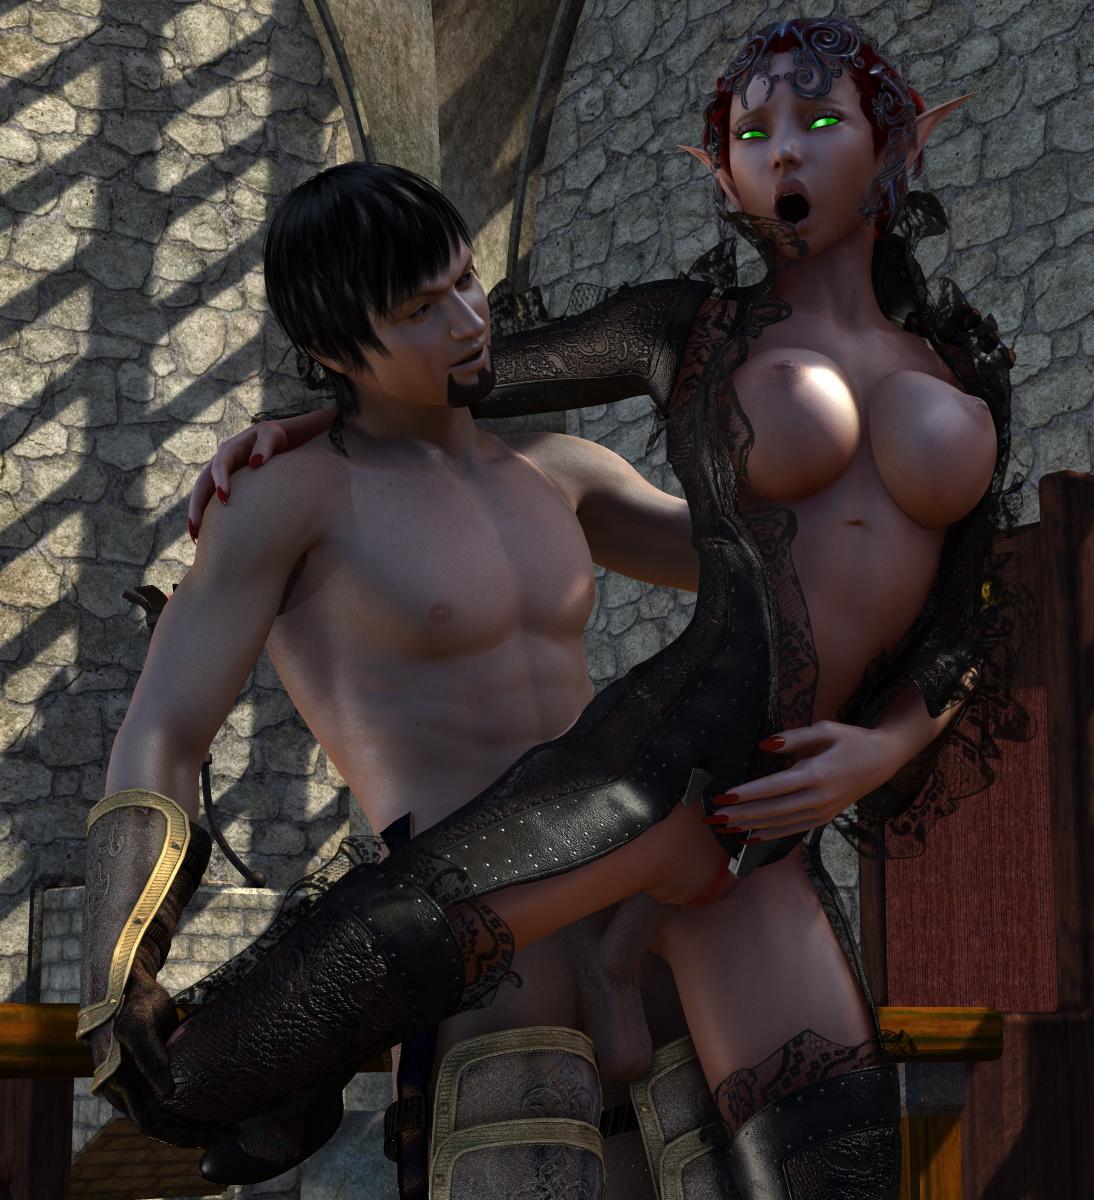 hot assassin girl anal